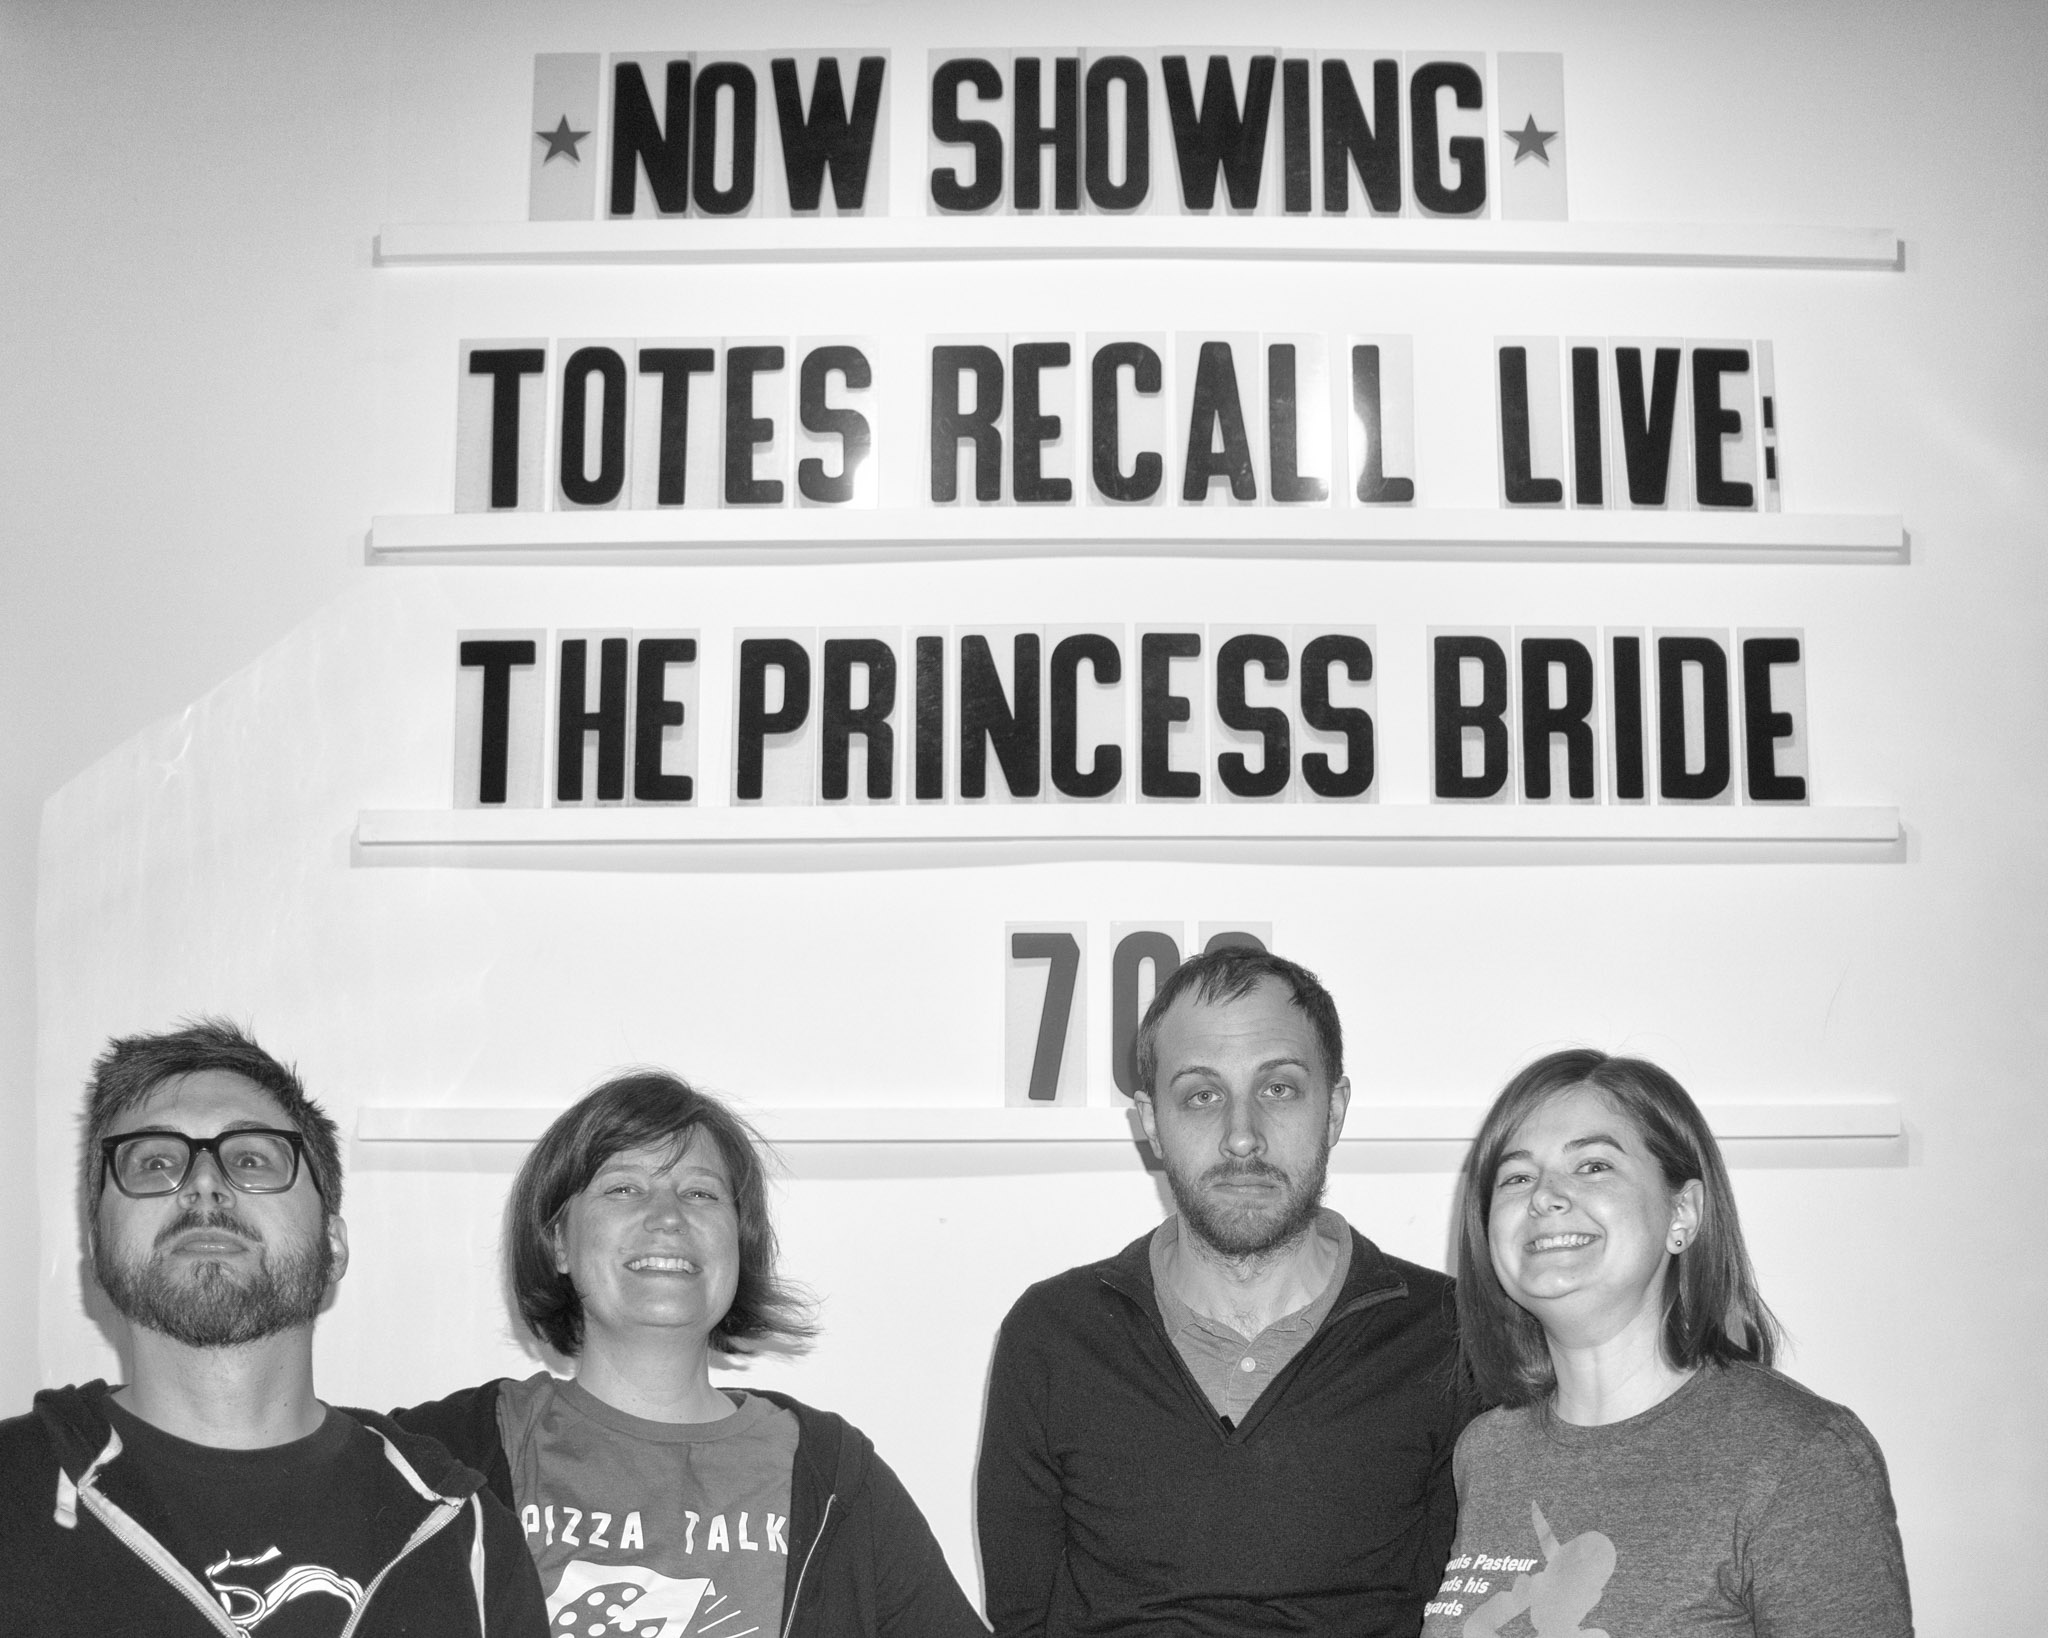 totes.recall.live.trylon.princess.bride-3.jpg